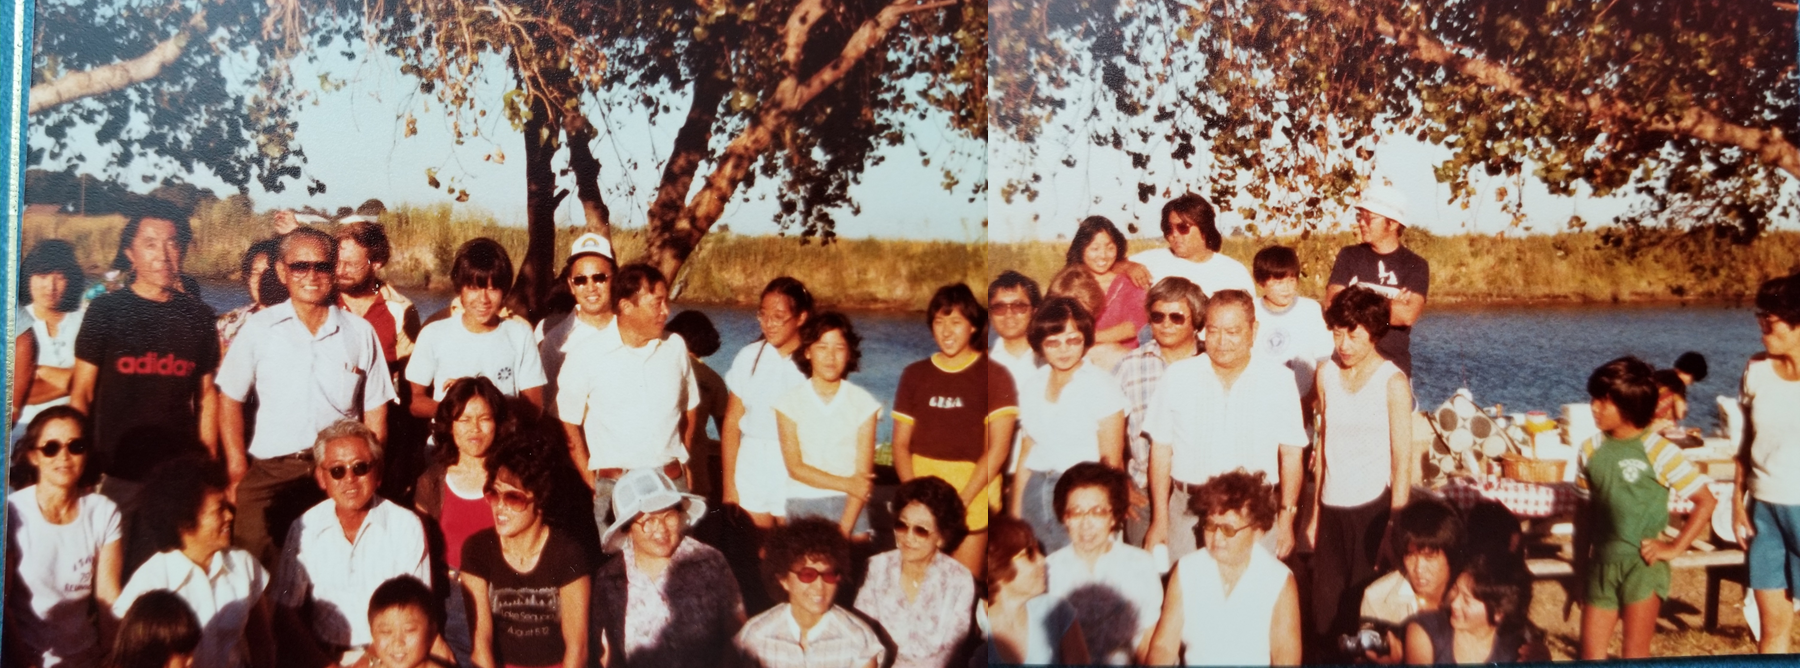 Itaya Family Reunion (ca. 1979 Brannan Island, SF, CA)